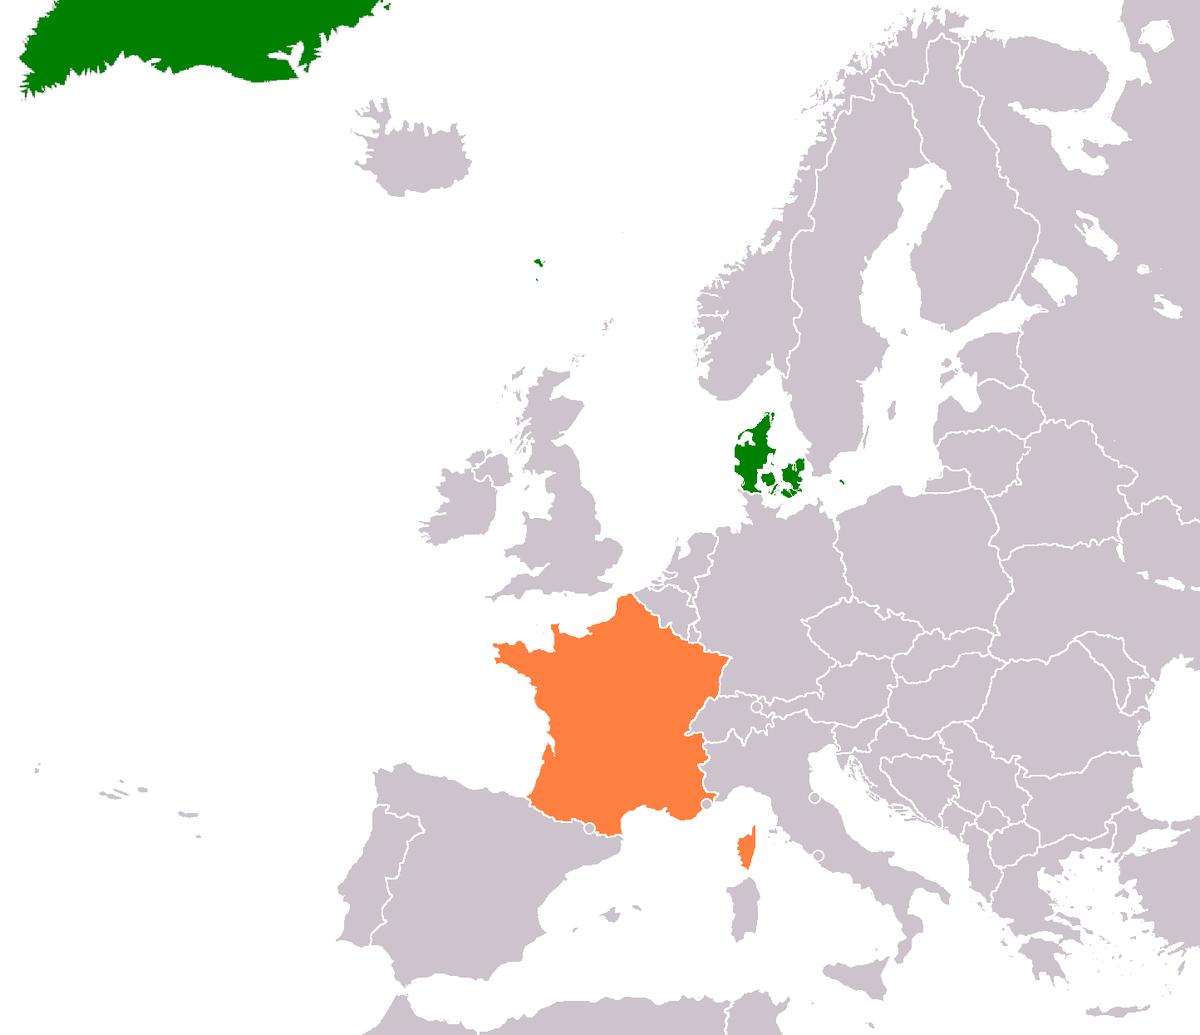 DenmarkFrance Relations Wikipedia - Sweden france map